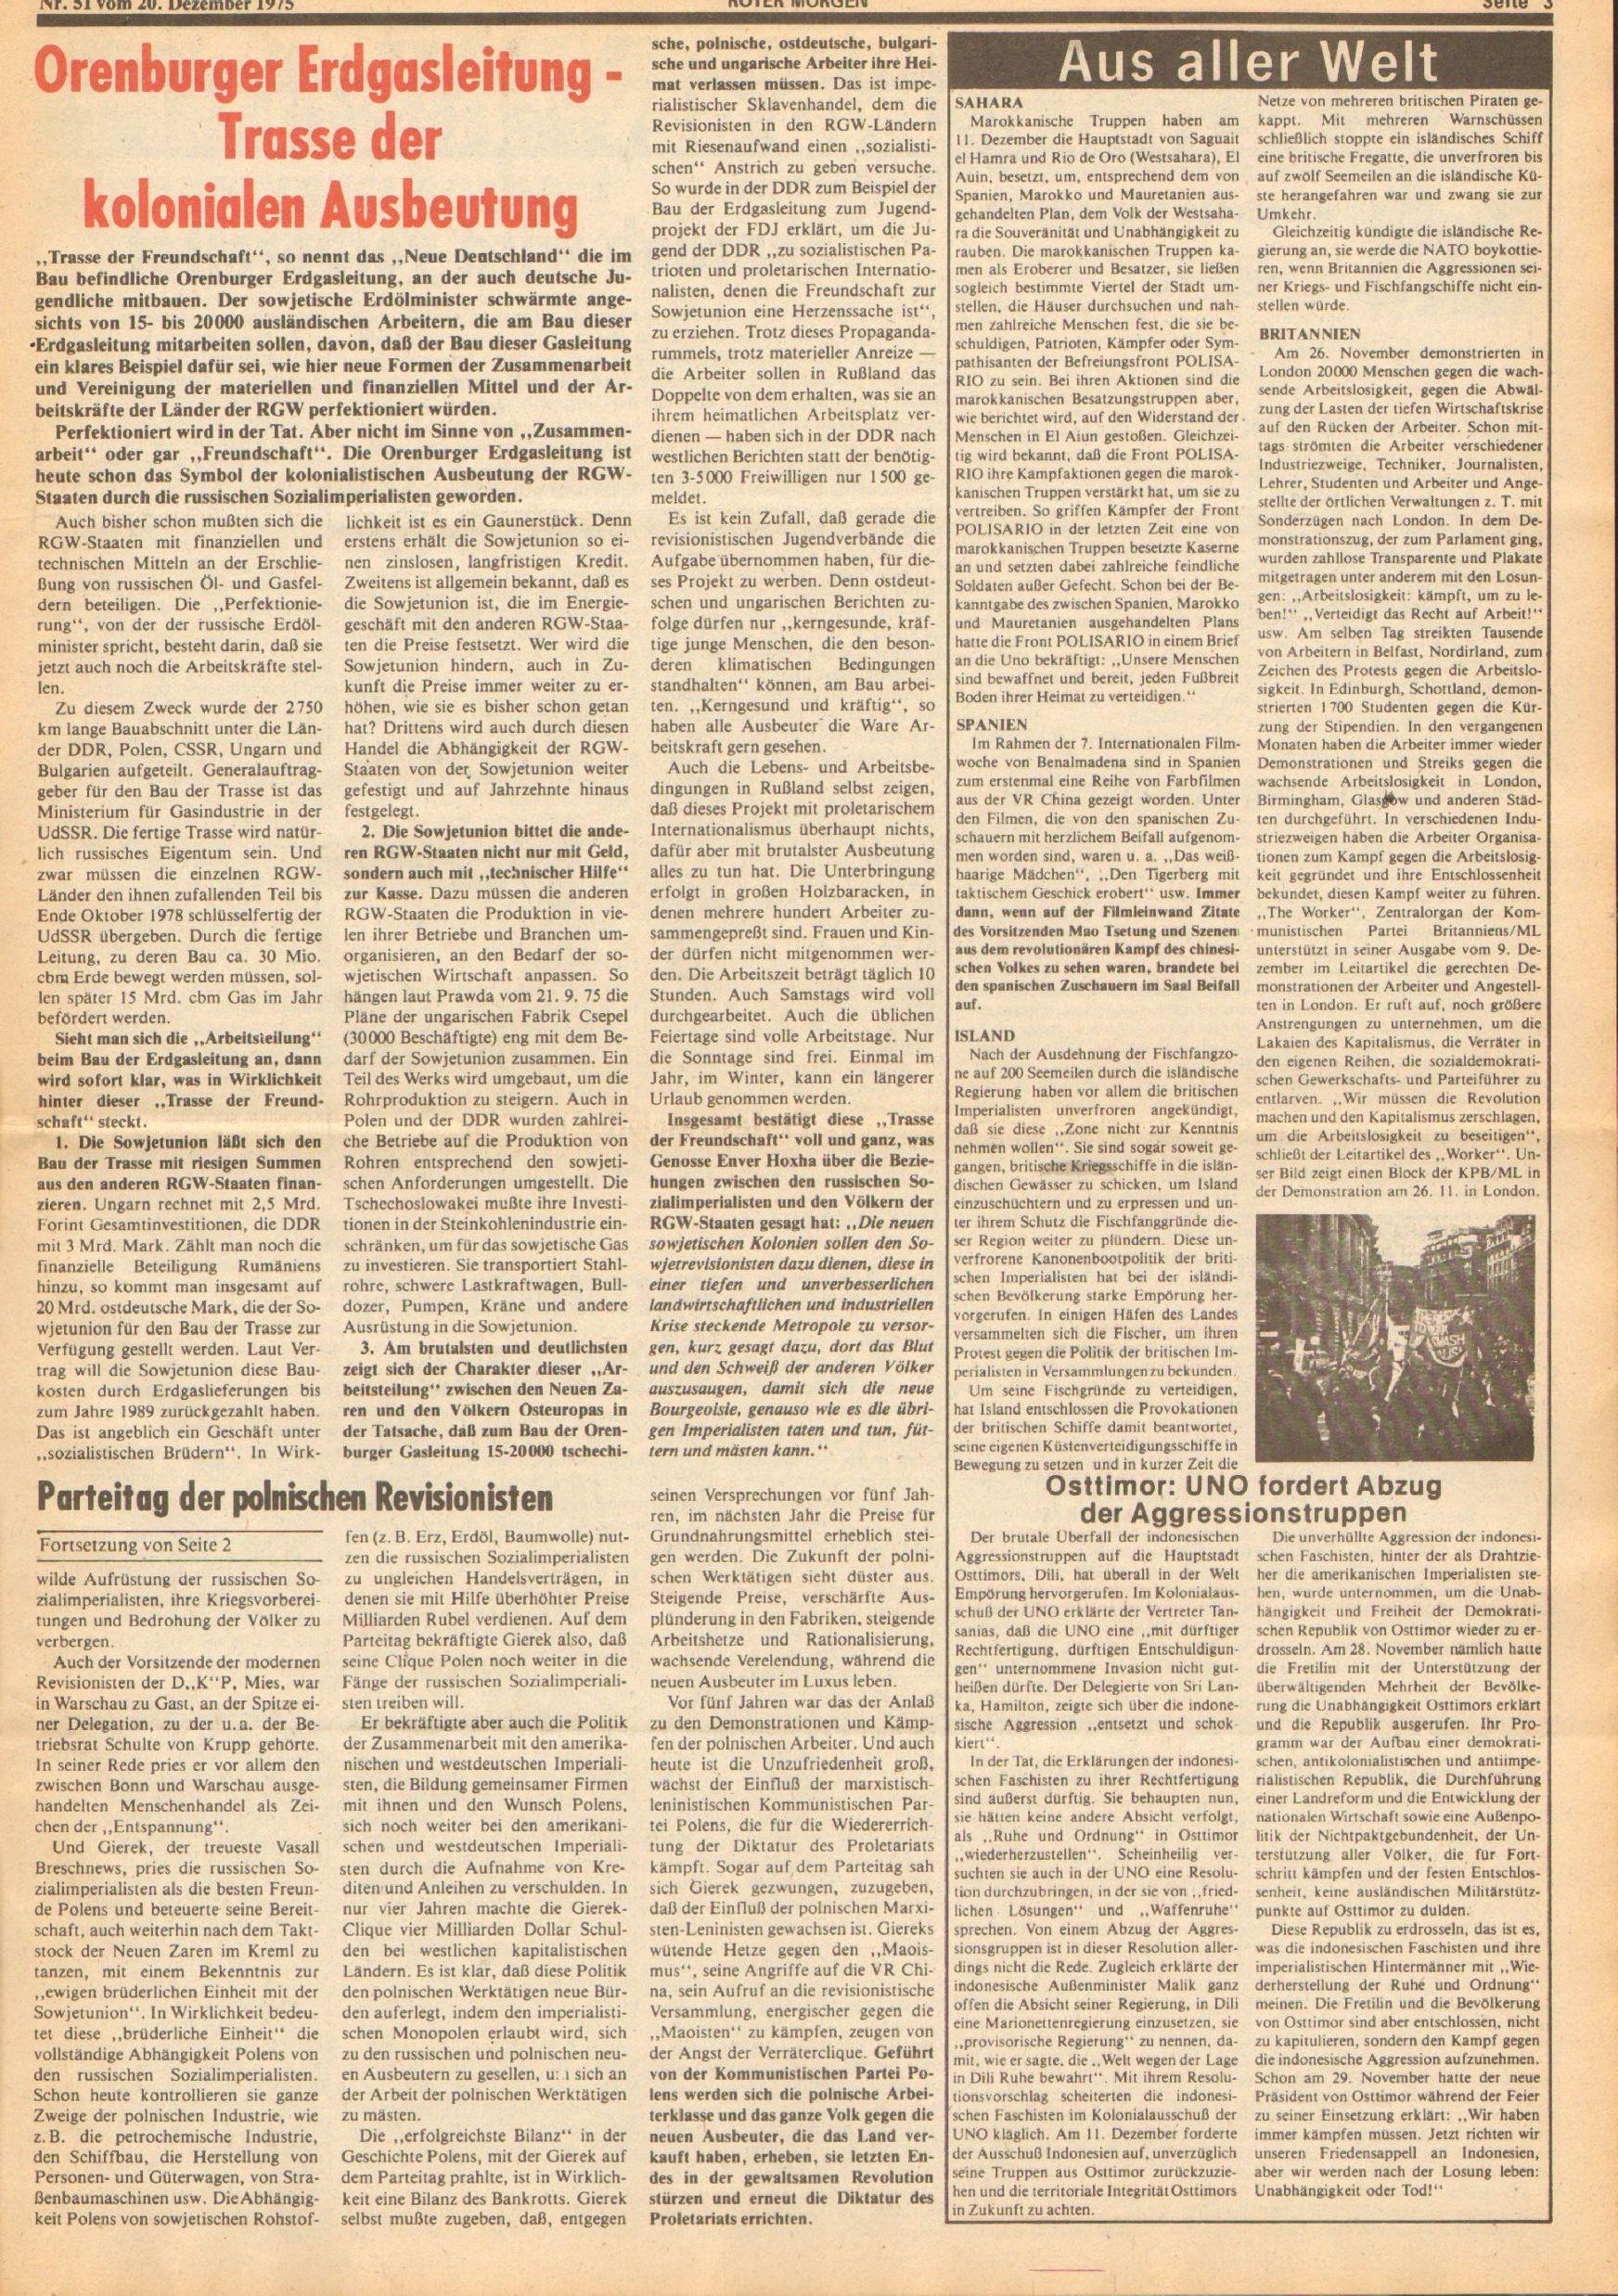 Roter Morgen, 9. Jg., 20. Dezember 1975, Nr. 51, Seite 3